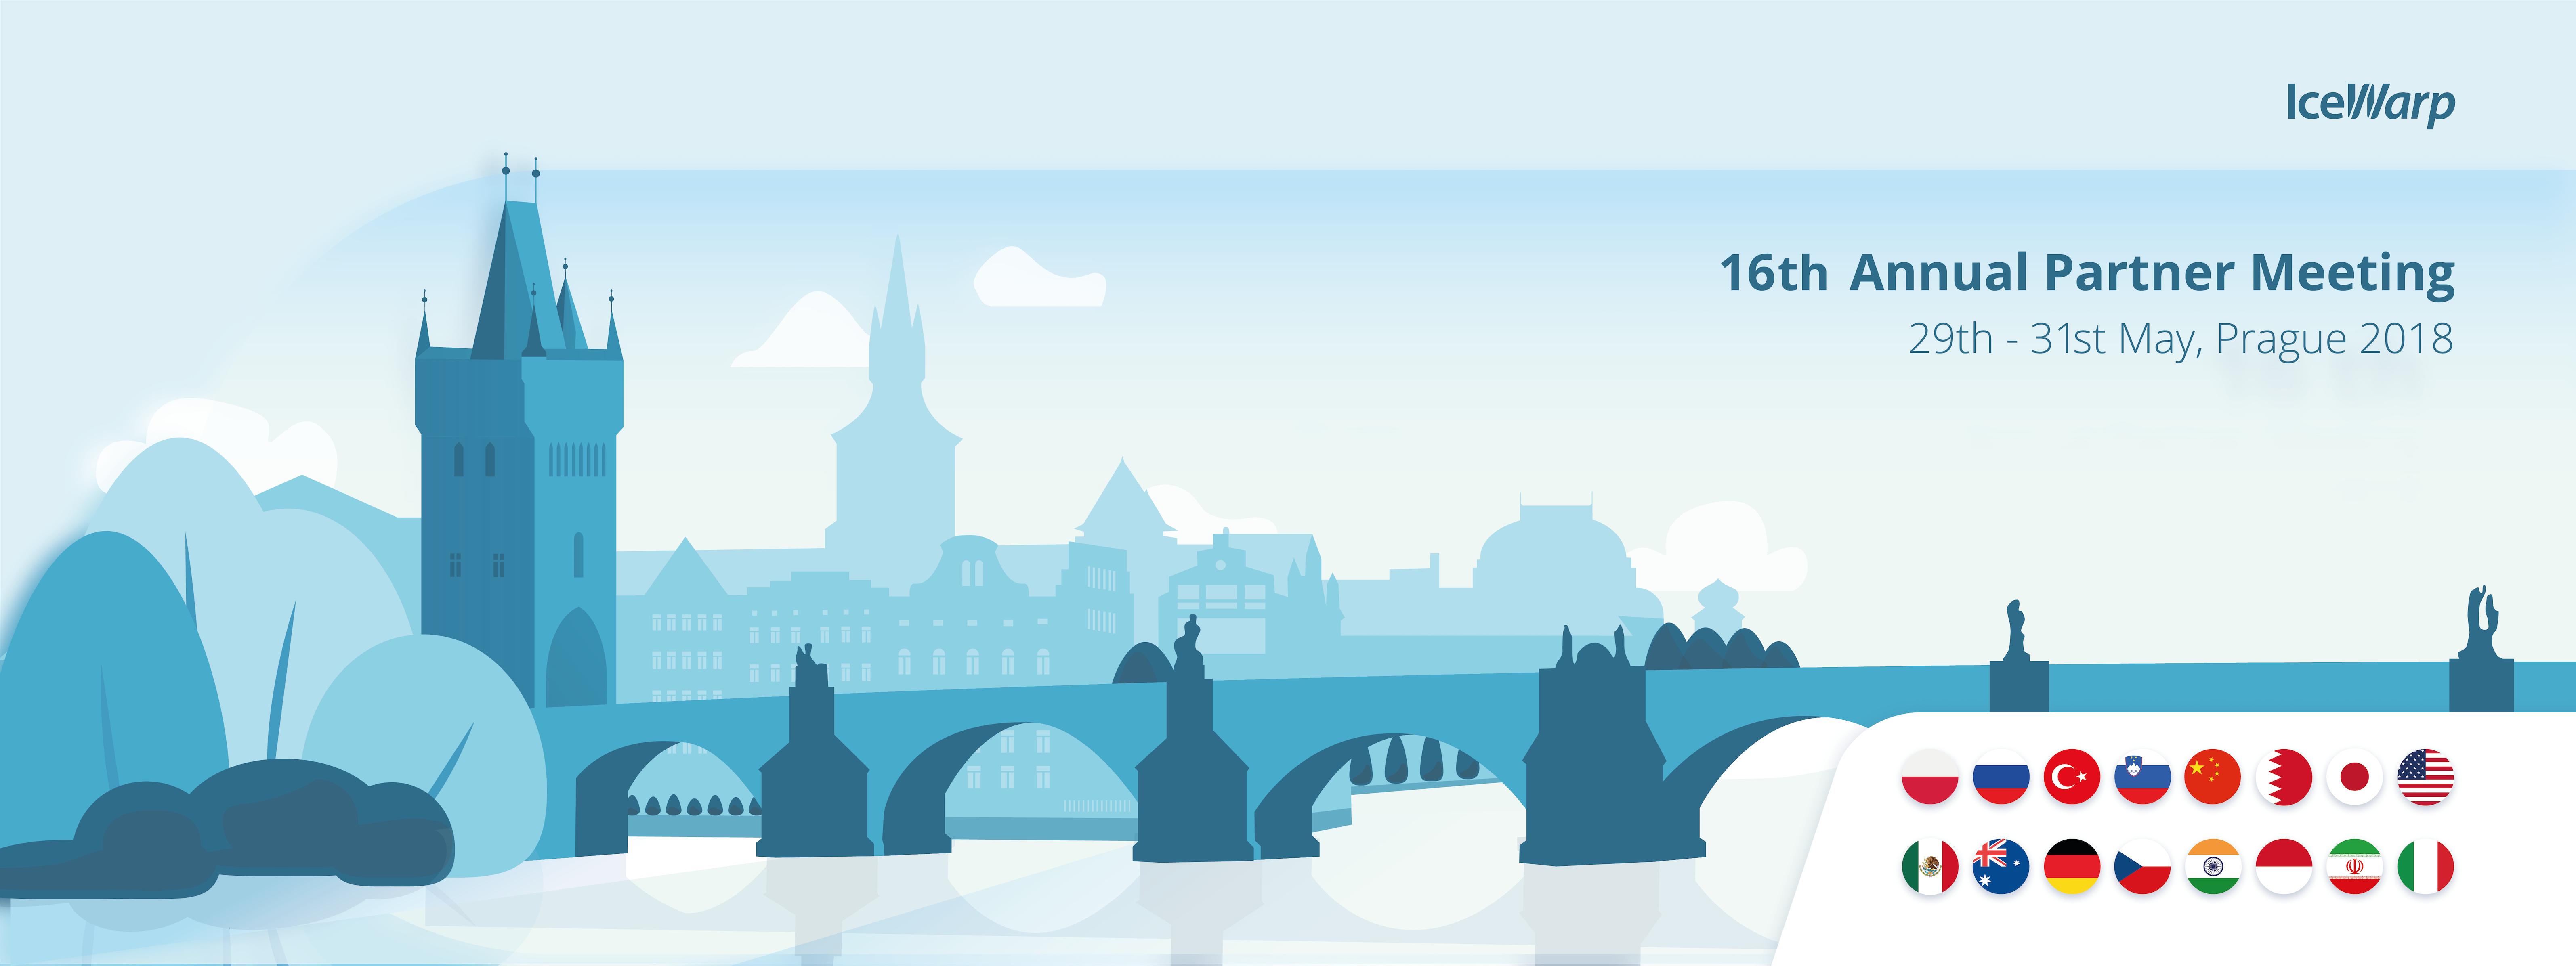 IceWarp Partner Conference 2018